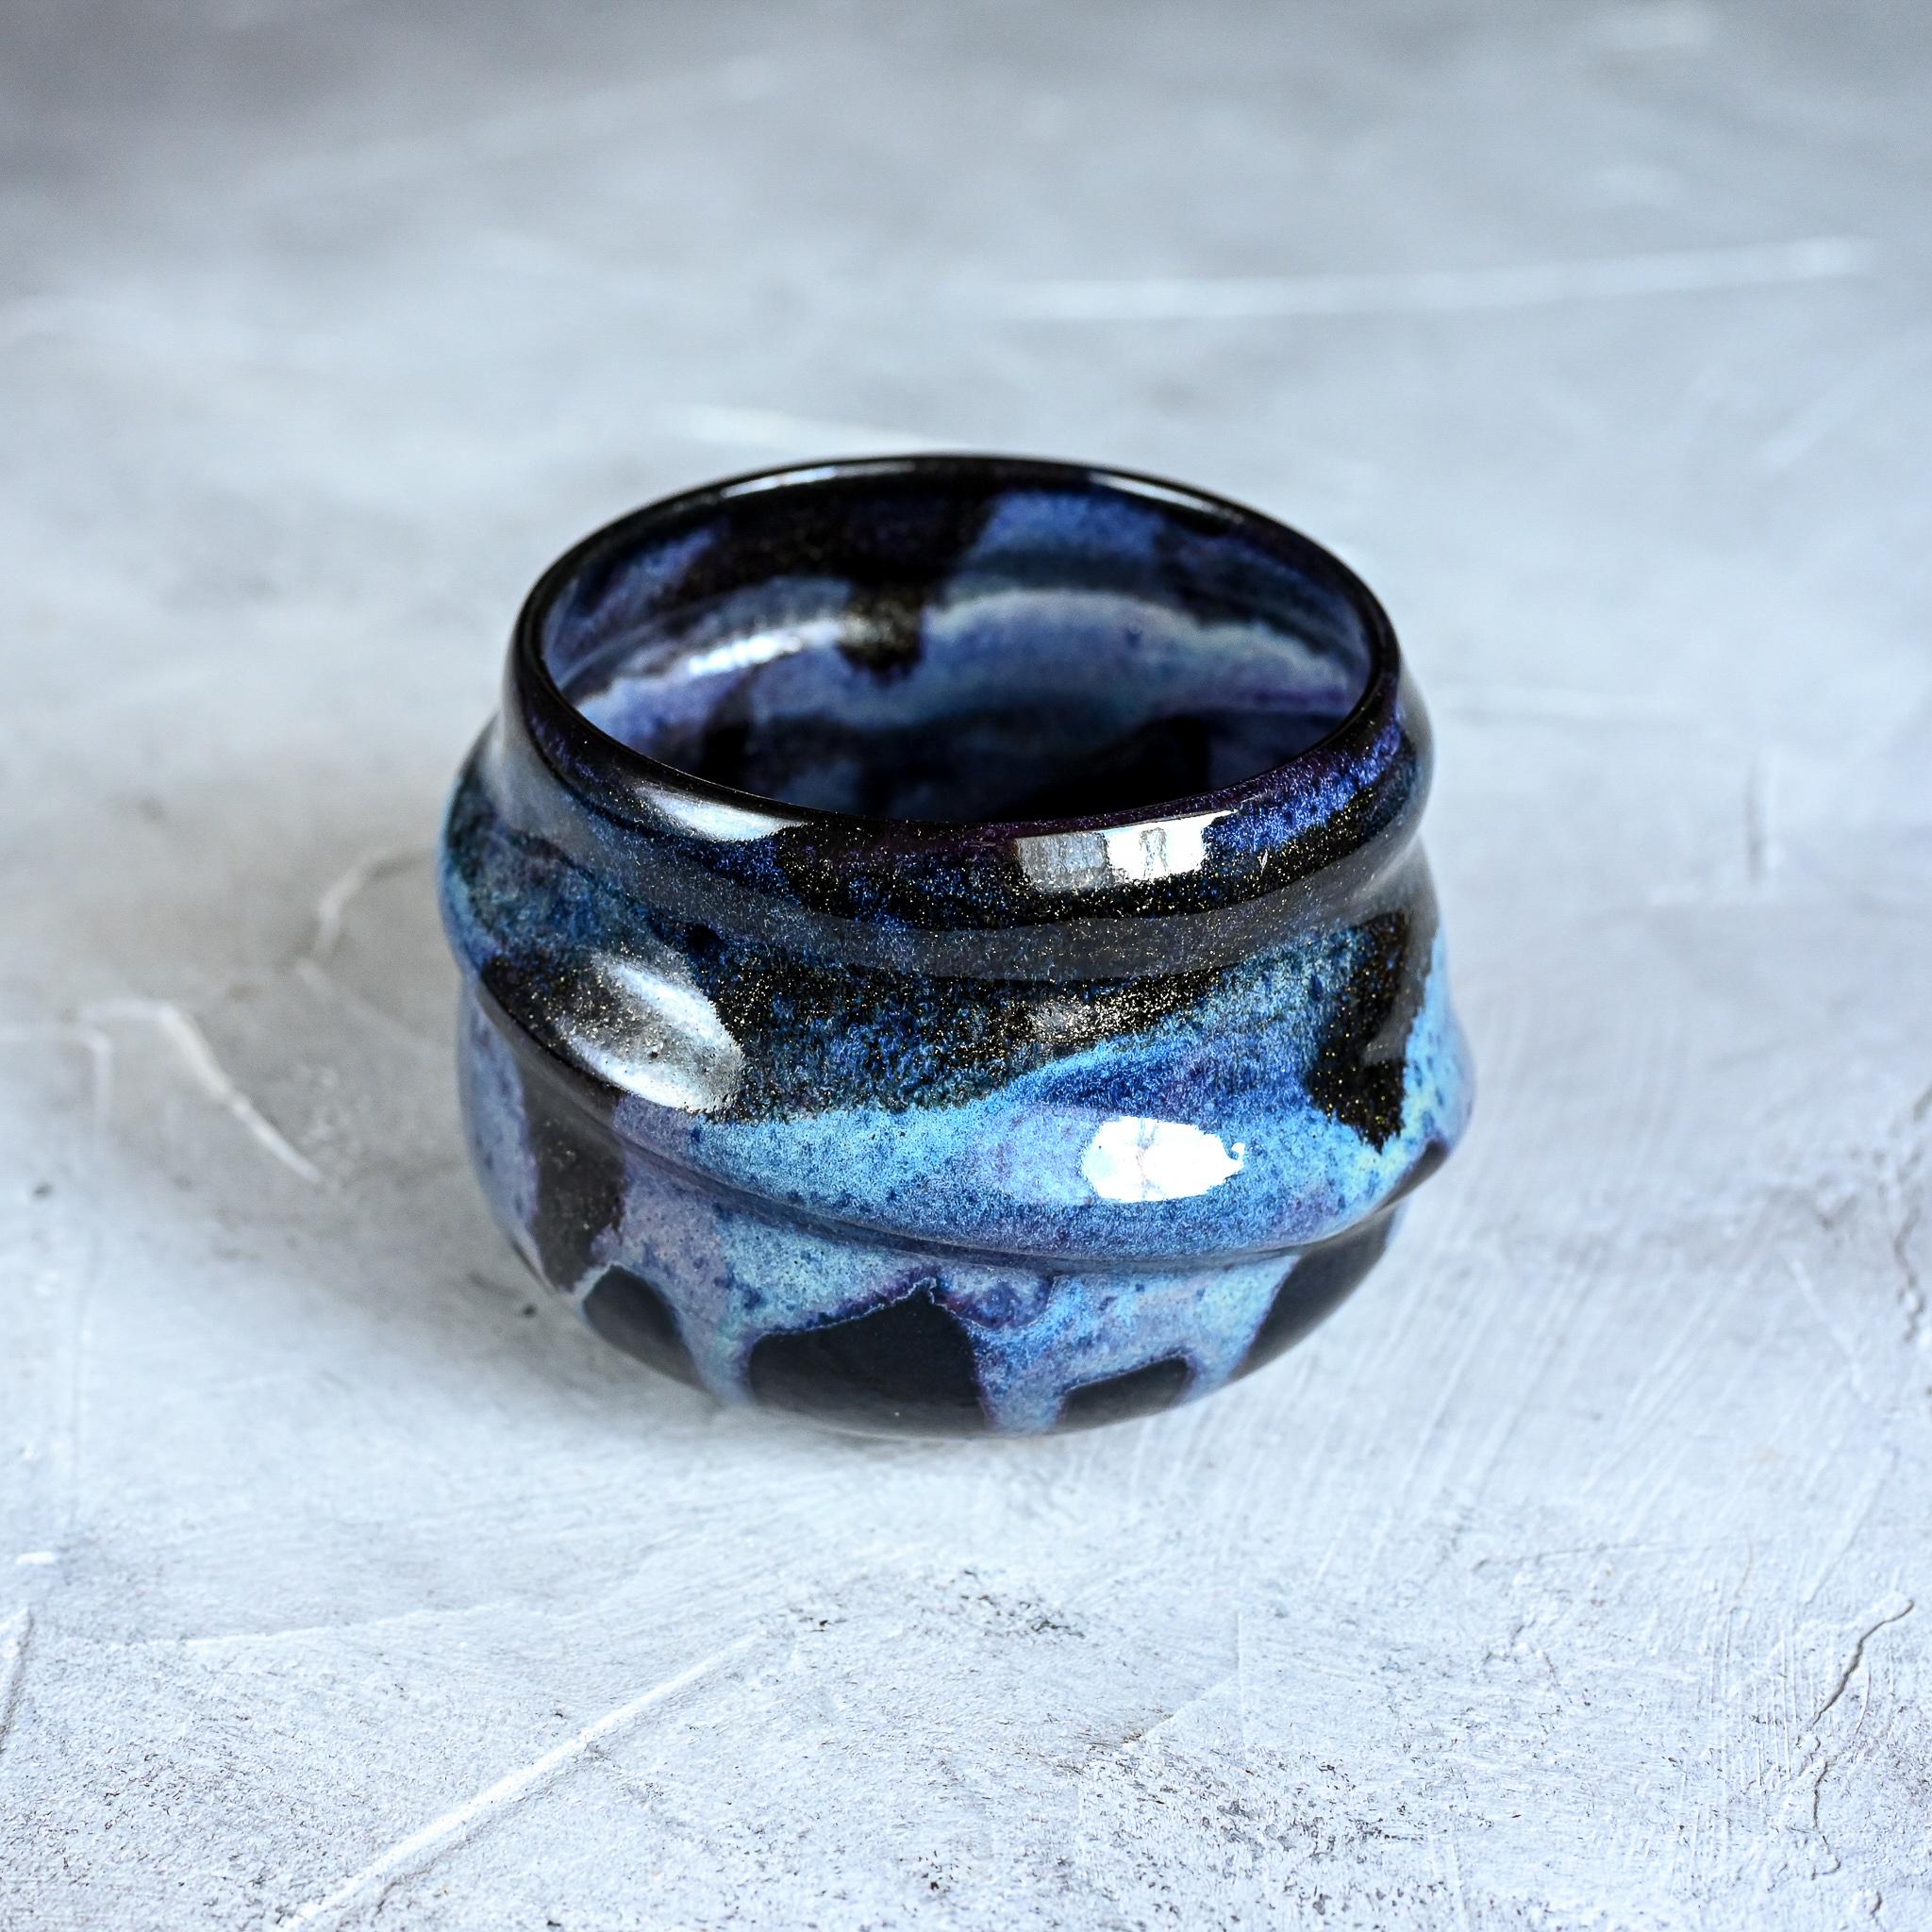 картинка Керамический стакан юноми Марии Левиной 11 - DishWishes.Ru